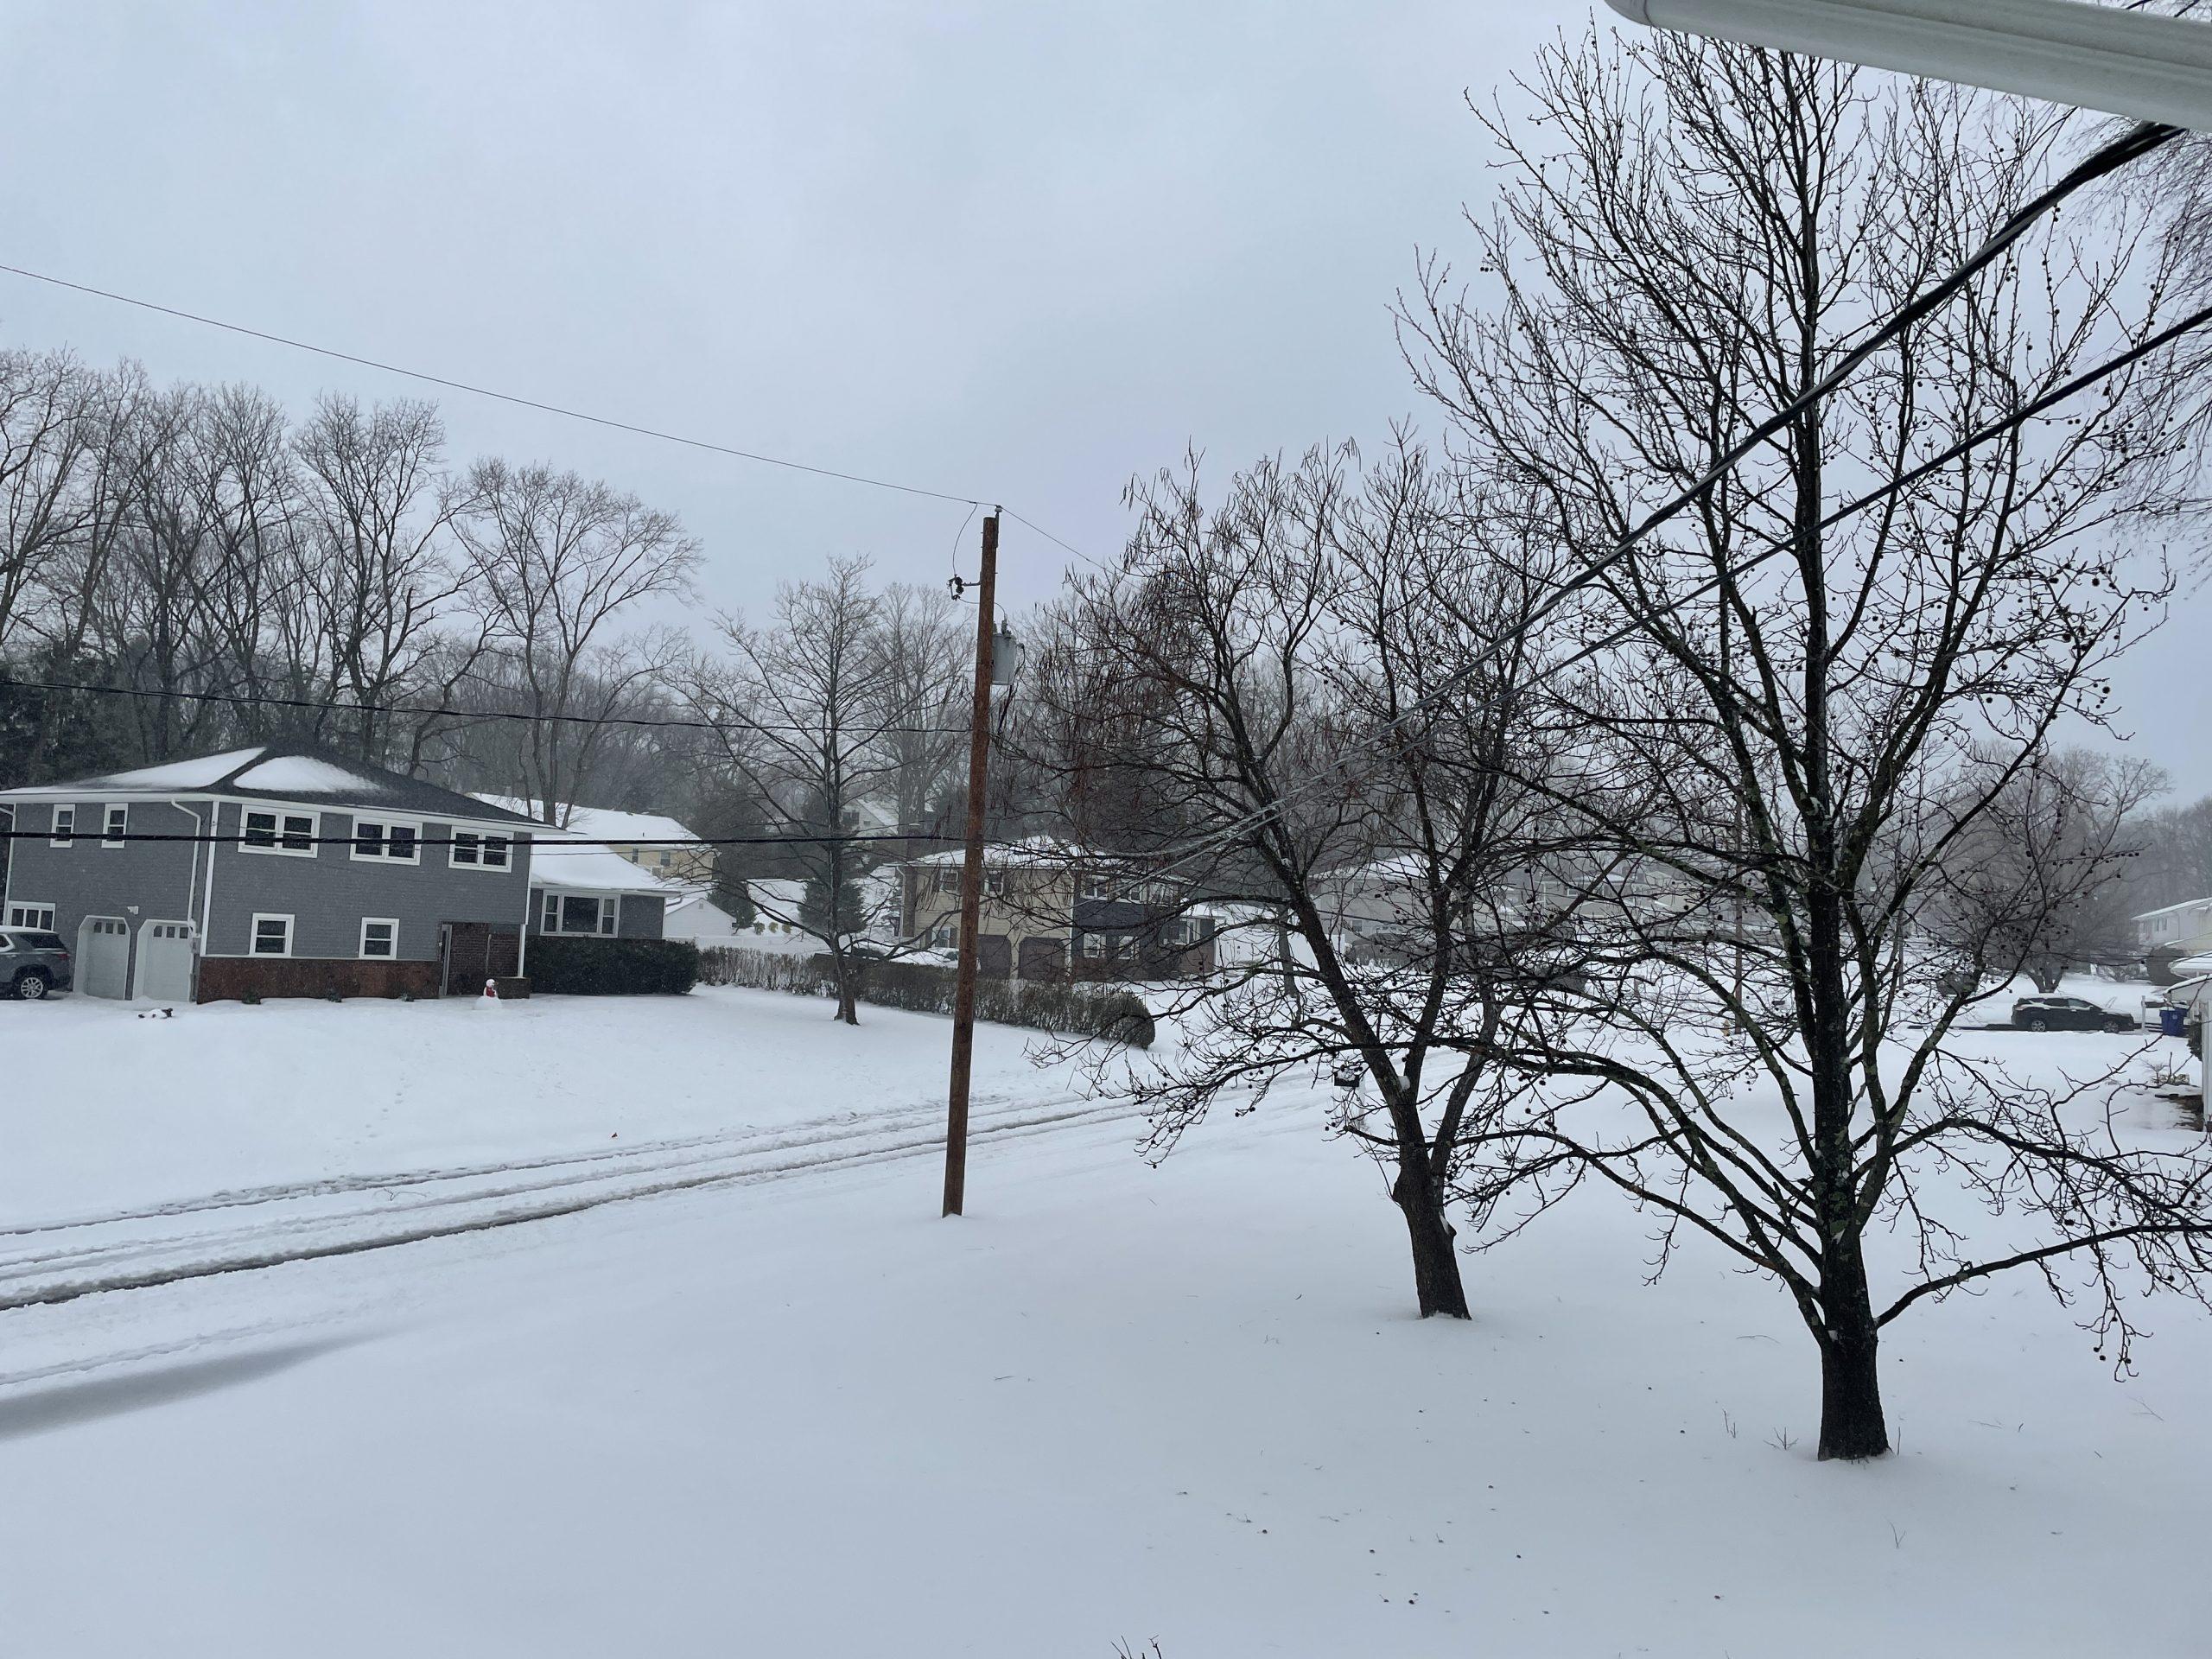 Snowfall in Brick Township N.J.'s Herbertsville section, Feb. 1, 2021. (Photo: Daniel Nee)